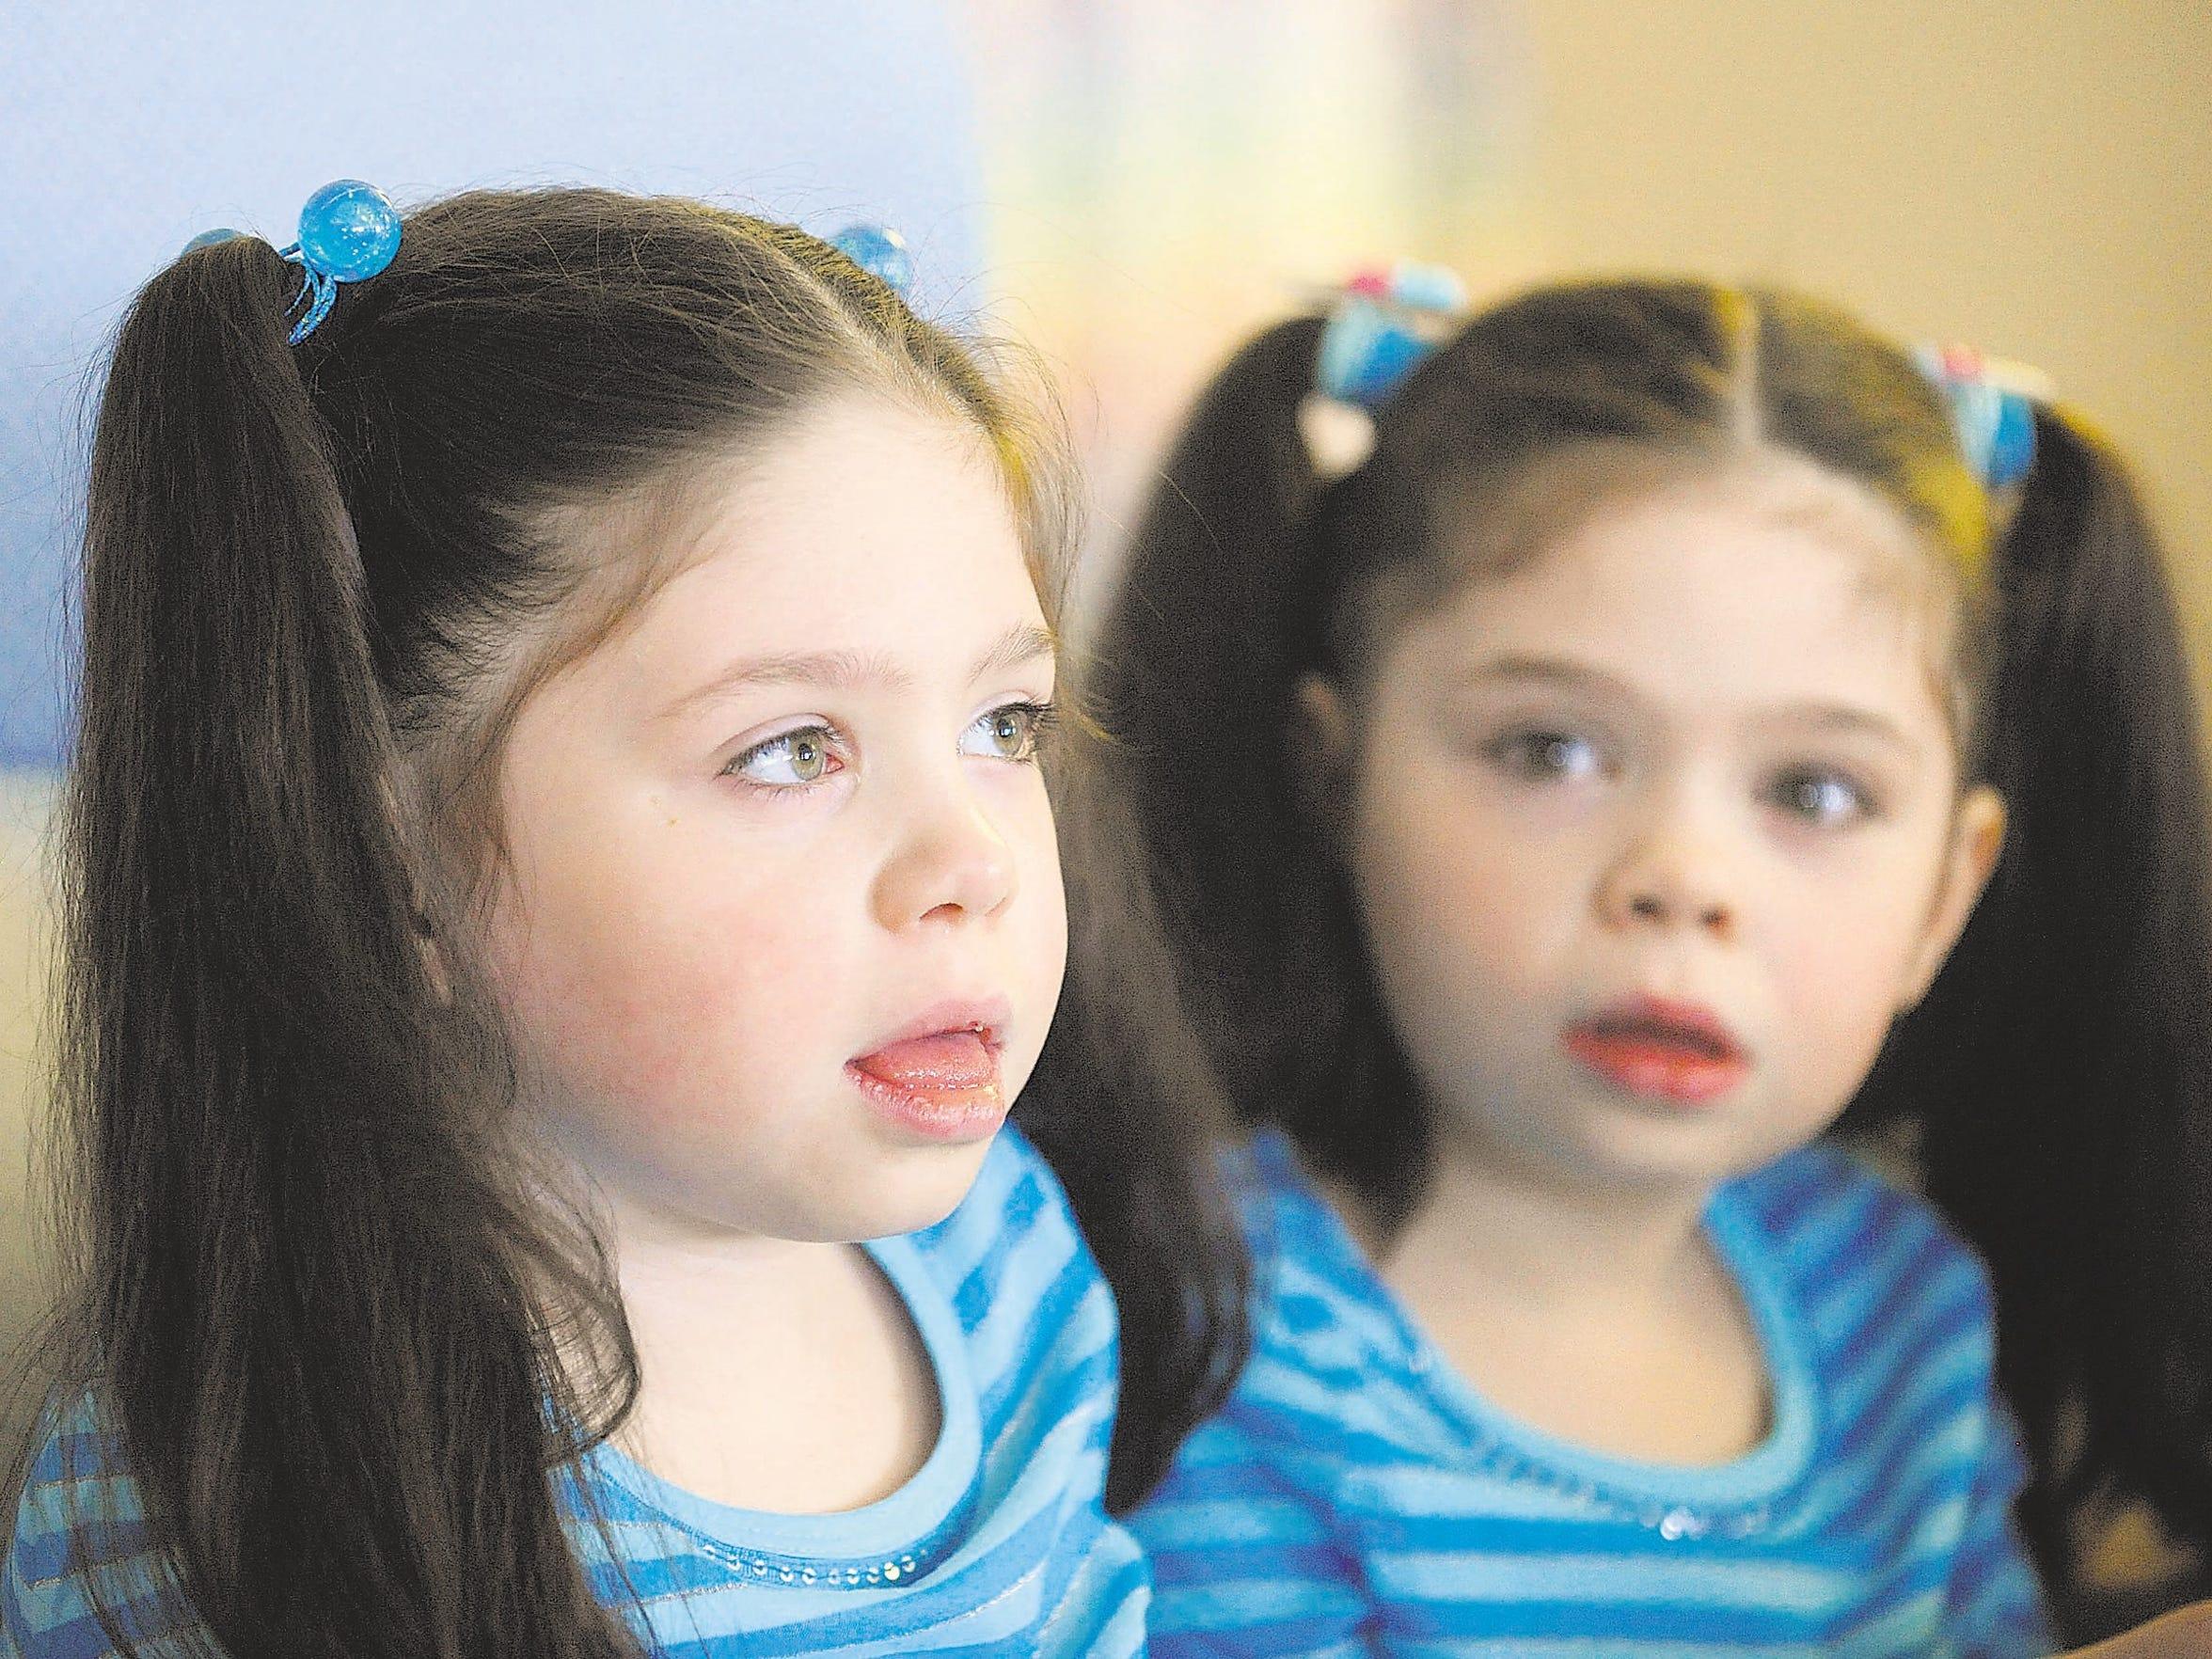 Twins Addi and Cassi Hempel, then 7, were diagnosed Neimann-Pick Type C disease.